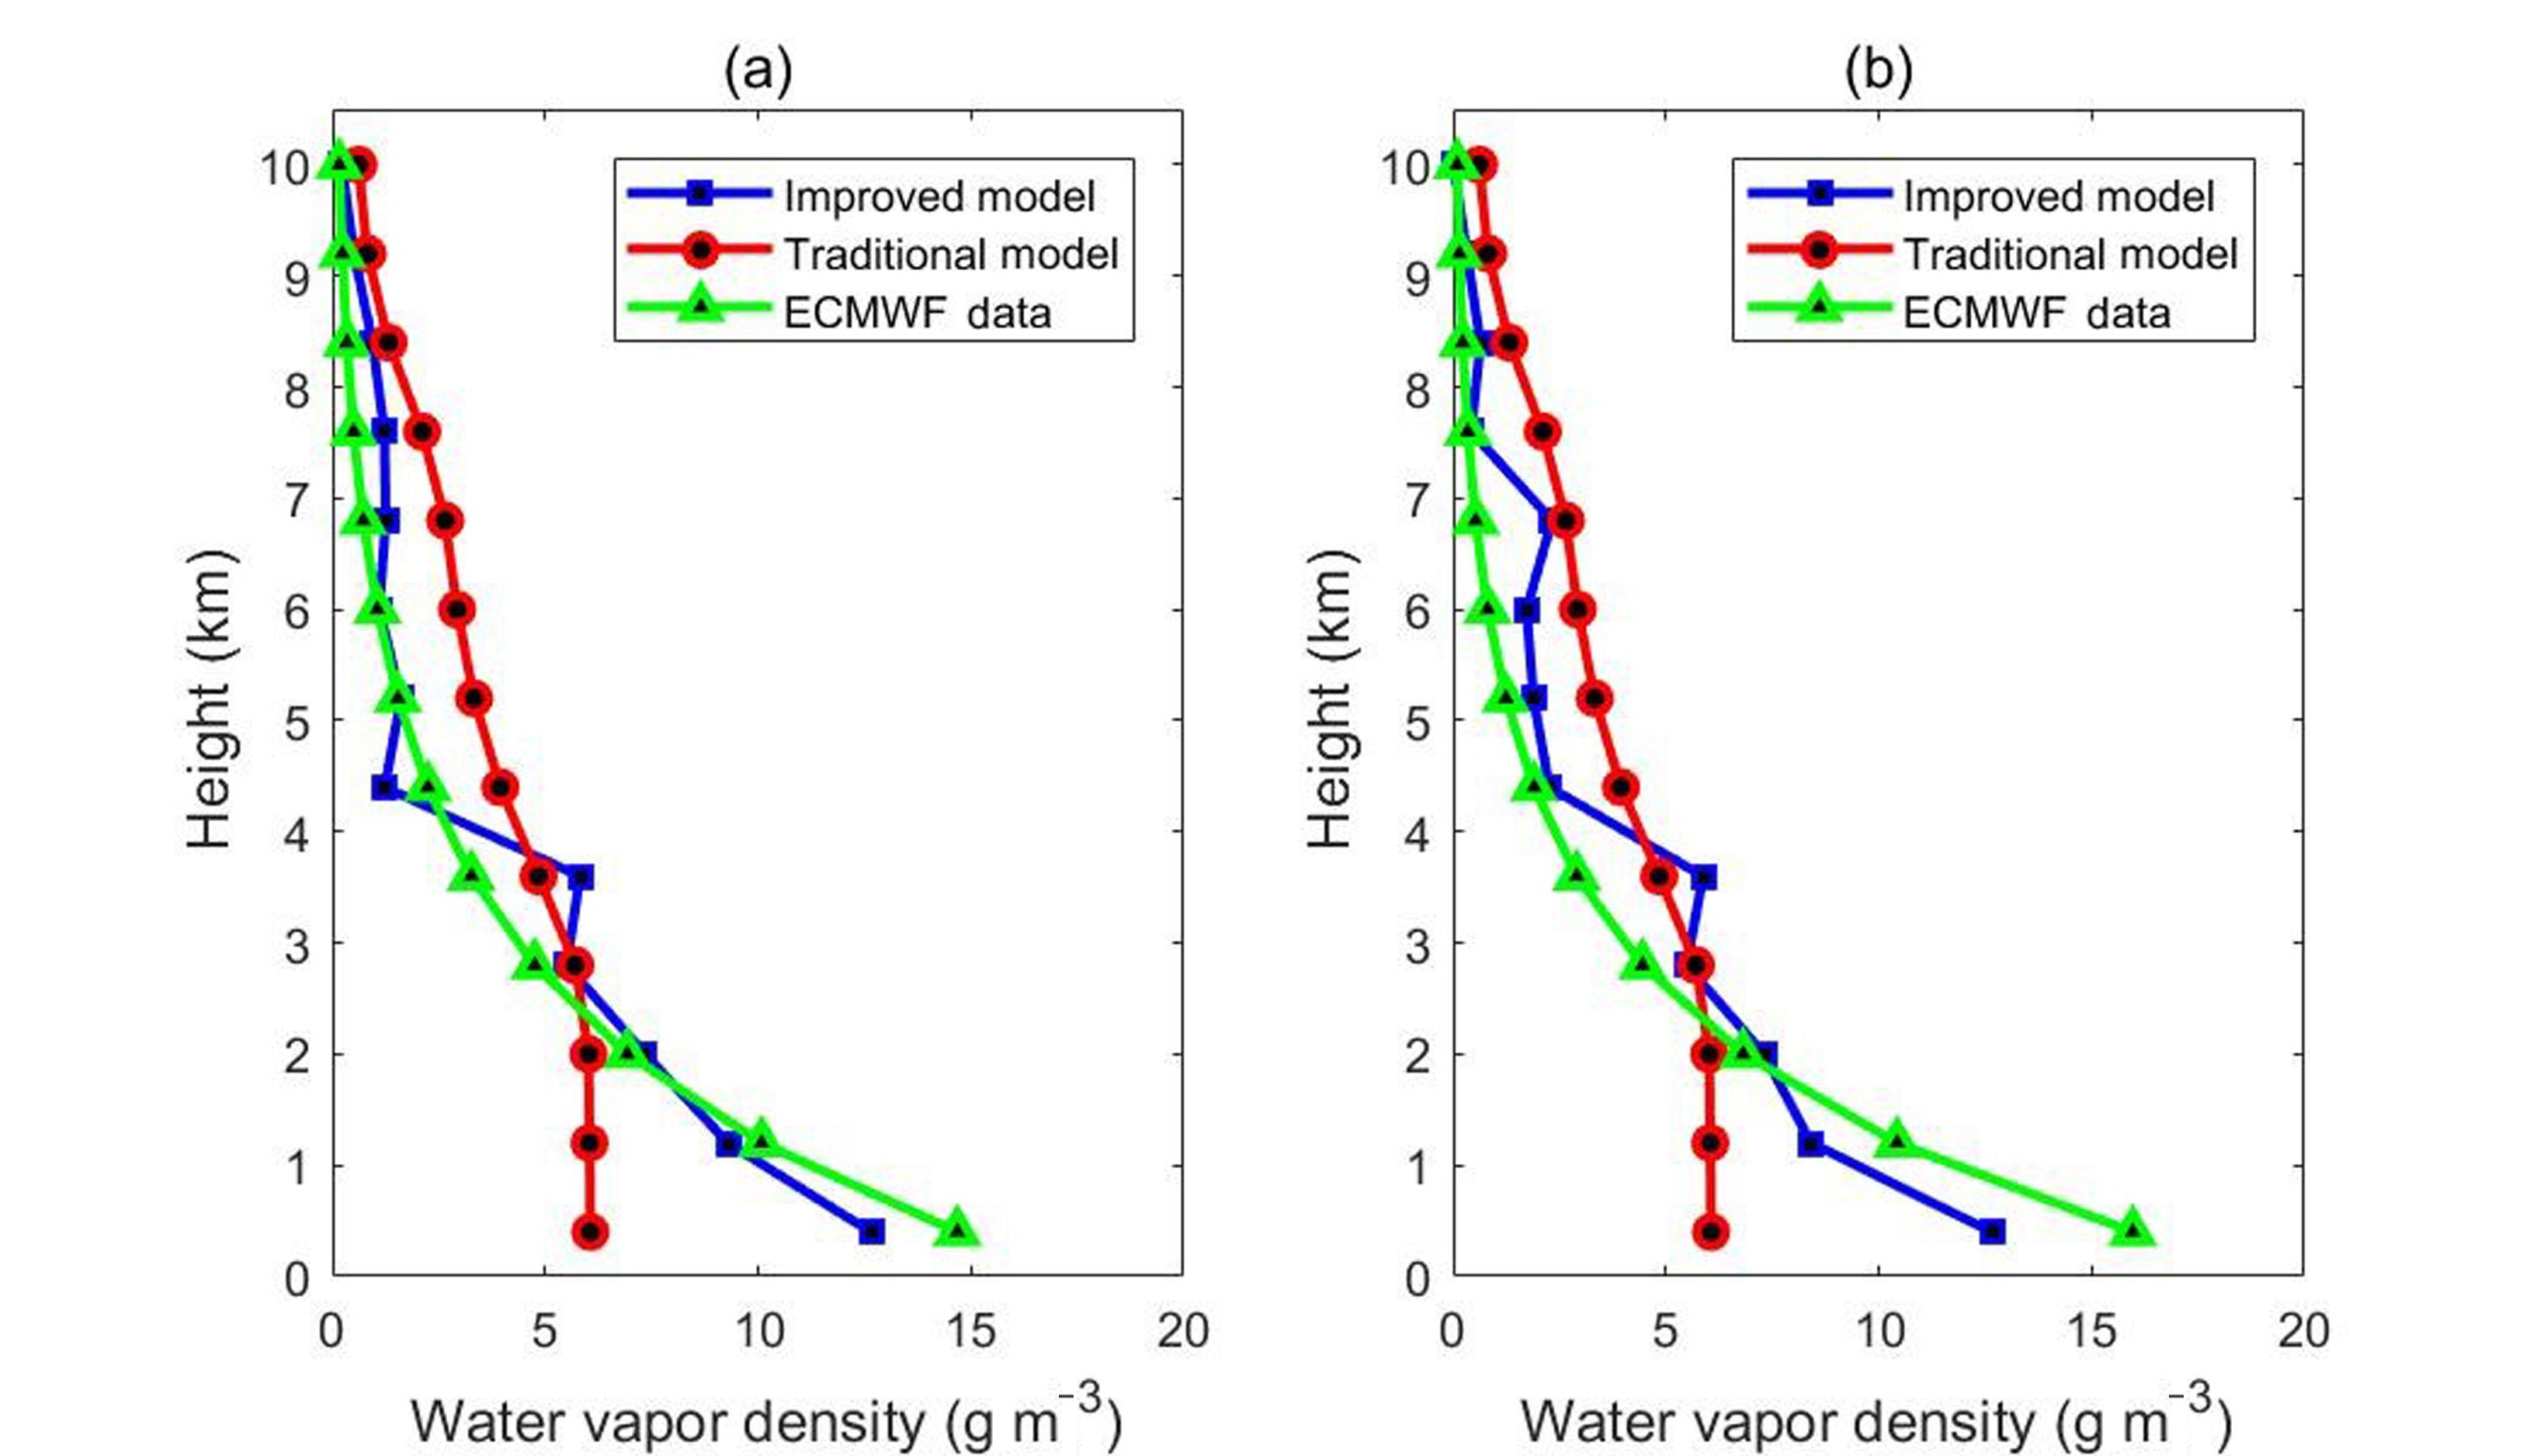 ANGEO - An improved pixel-based water vapor tomography model